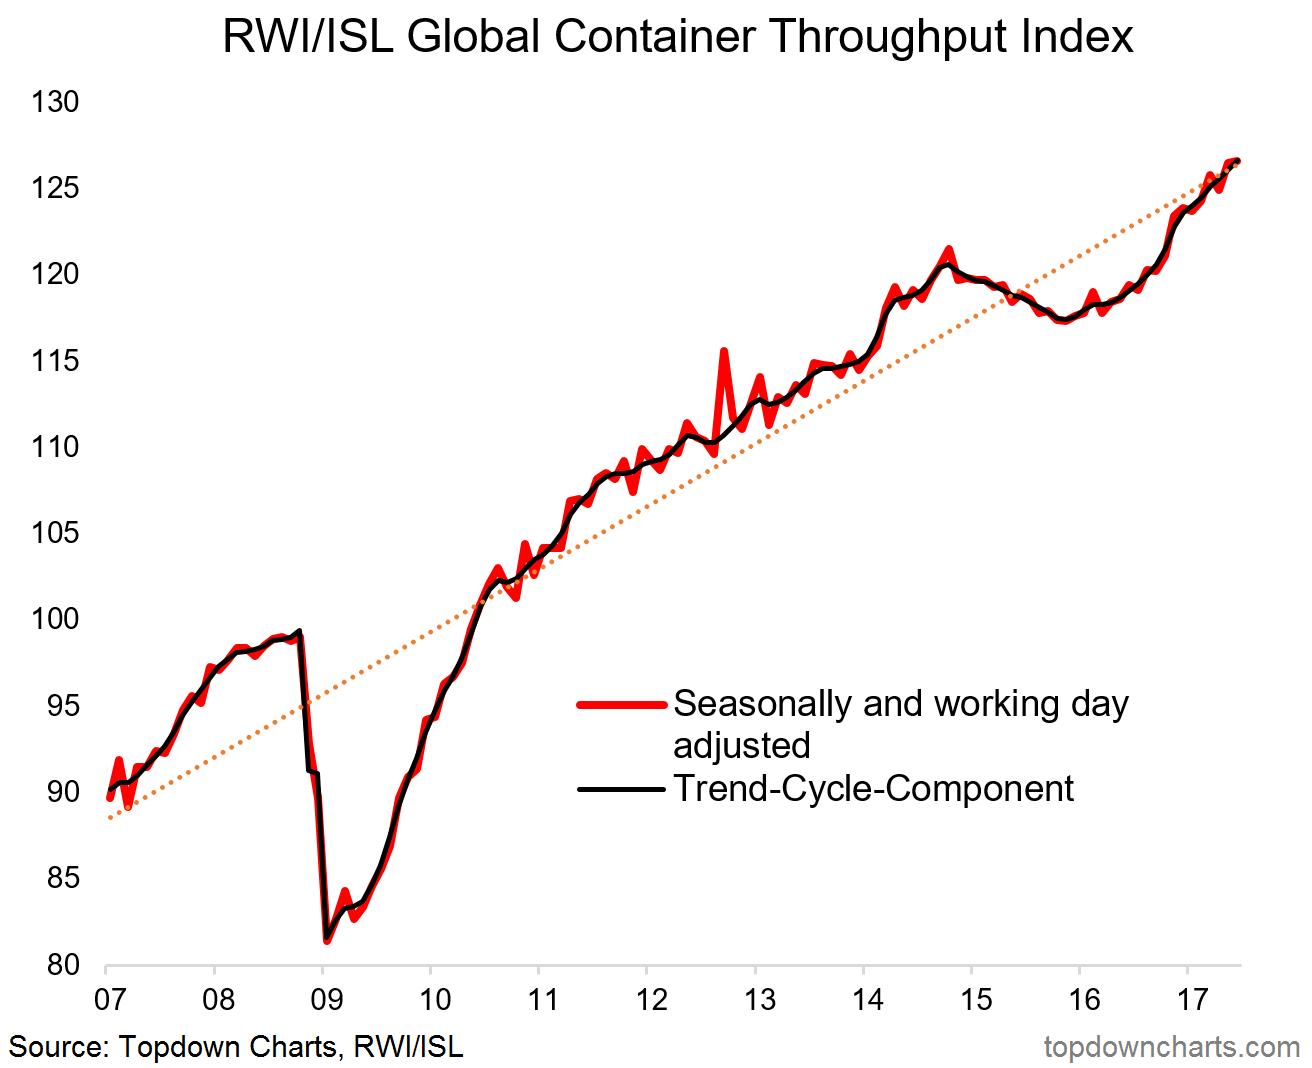 Containerthroughput